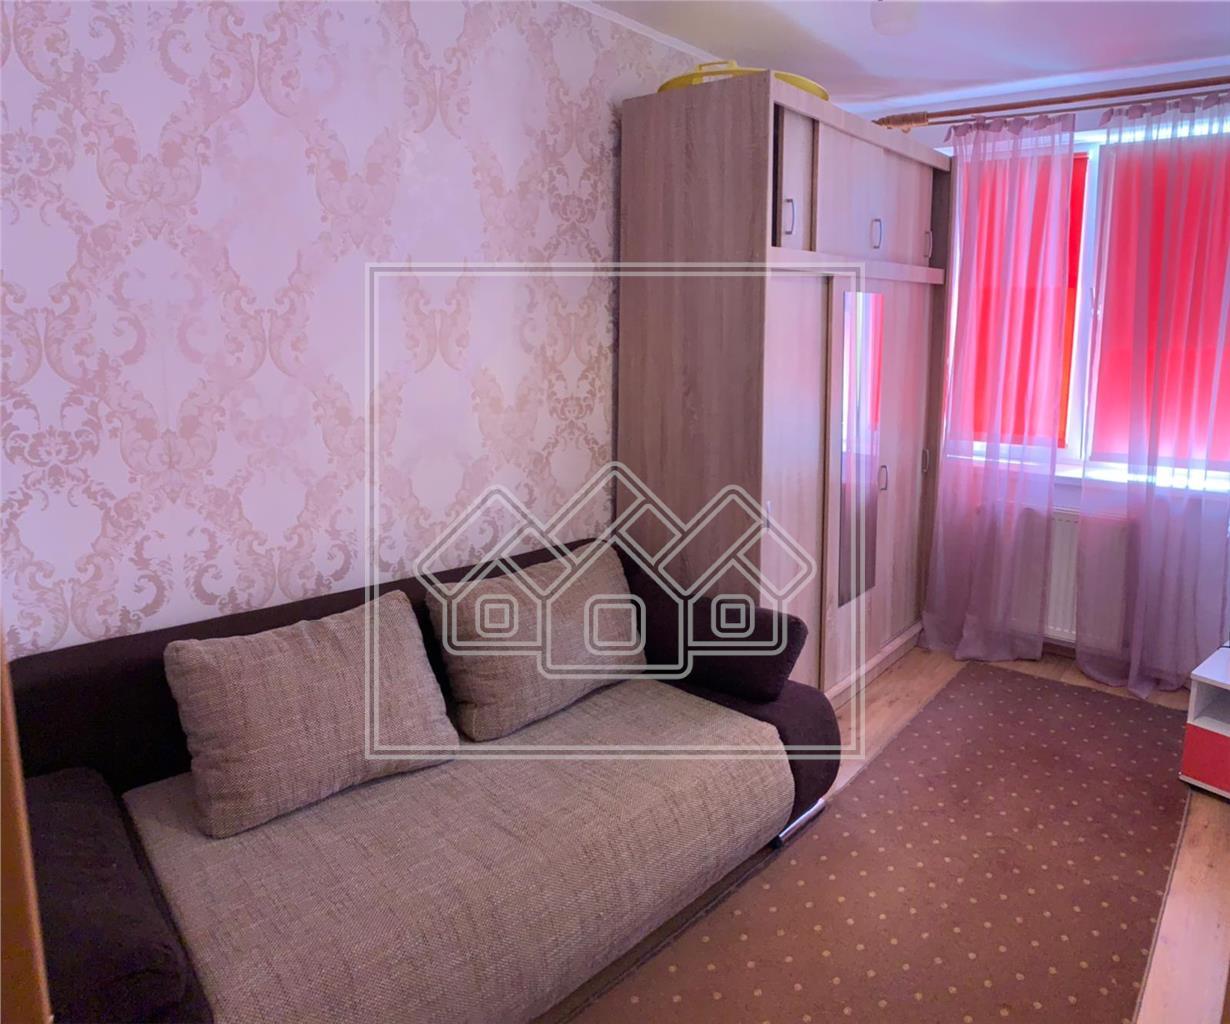 Apartament de vanzare in Sibiu cu 3 Camere situat la Etajul 2